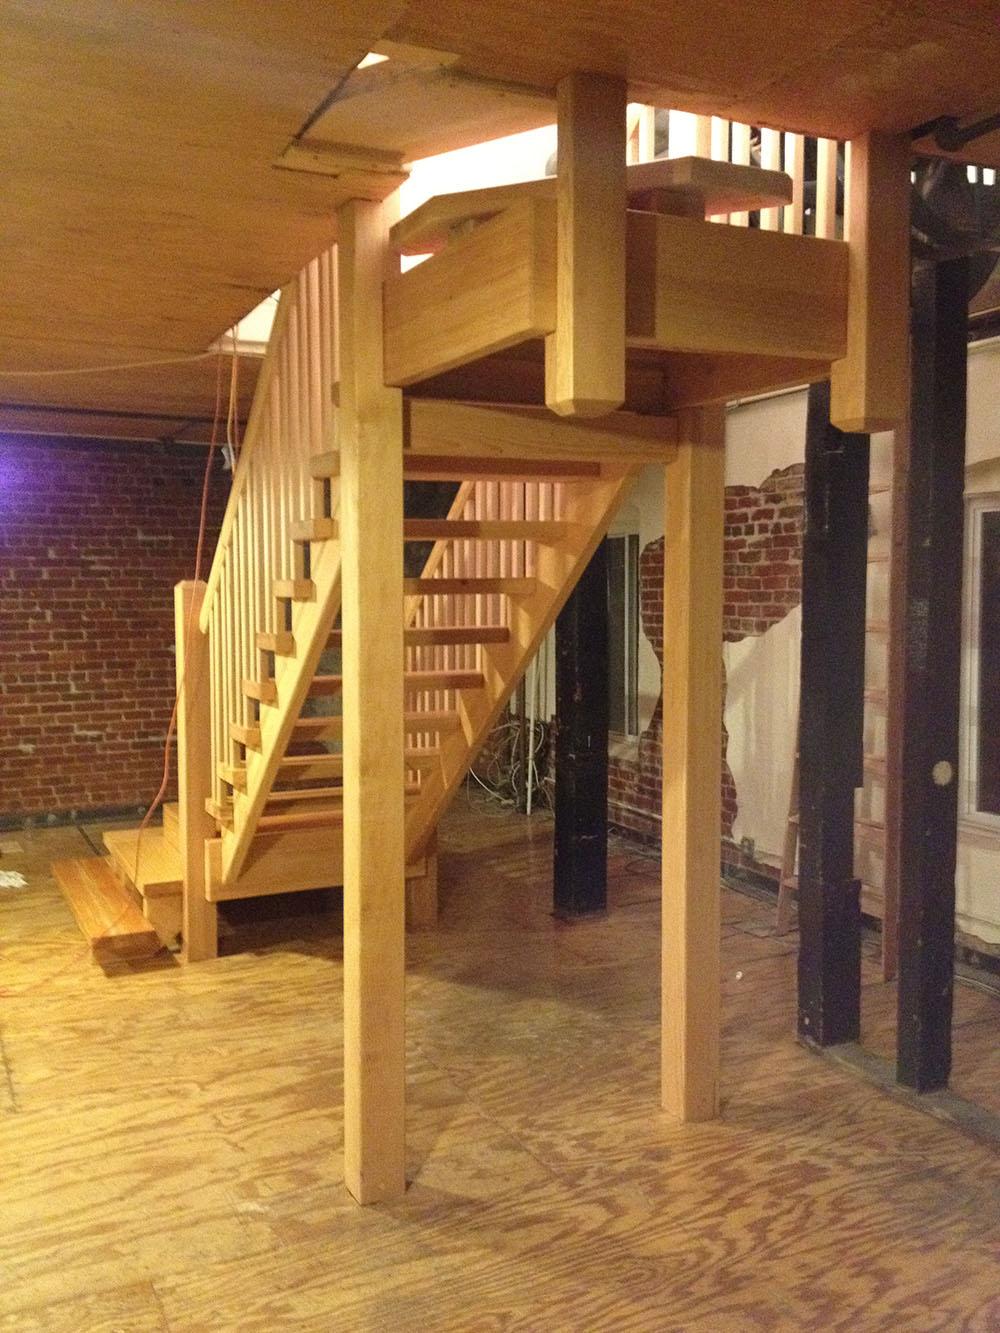 Bryant-St.-Stairs-Kevin-P-Clarke0009.jpg